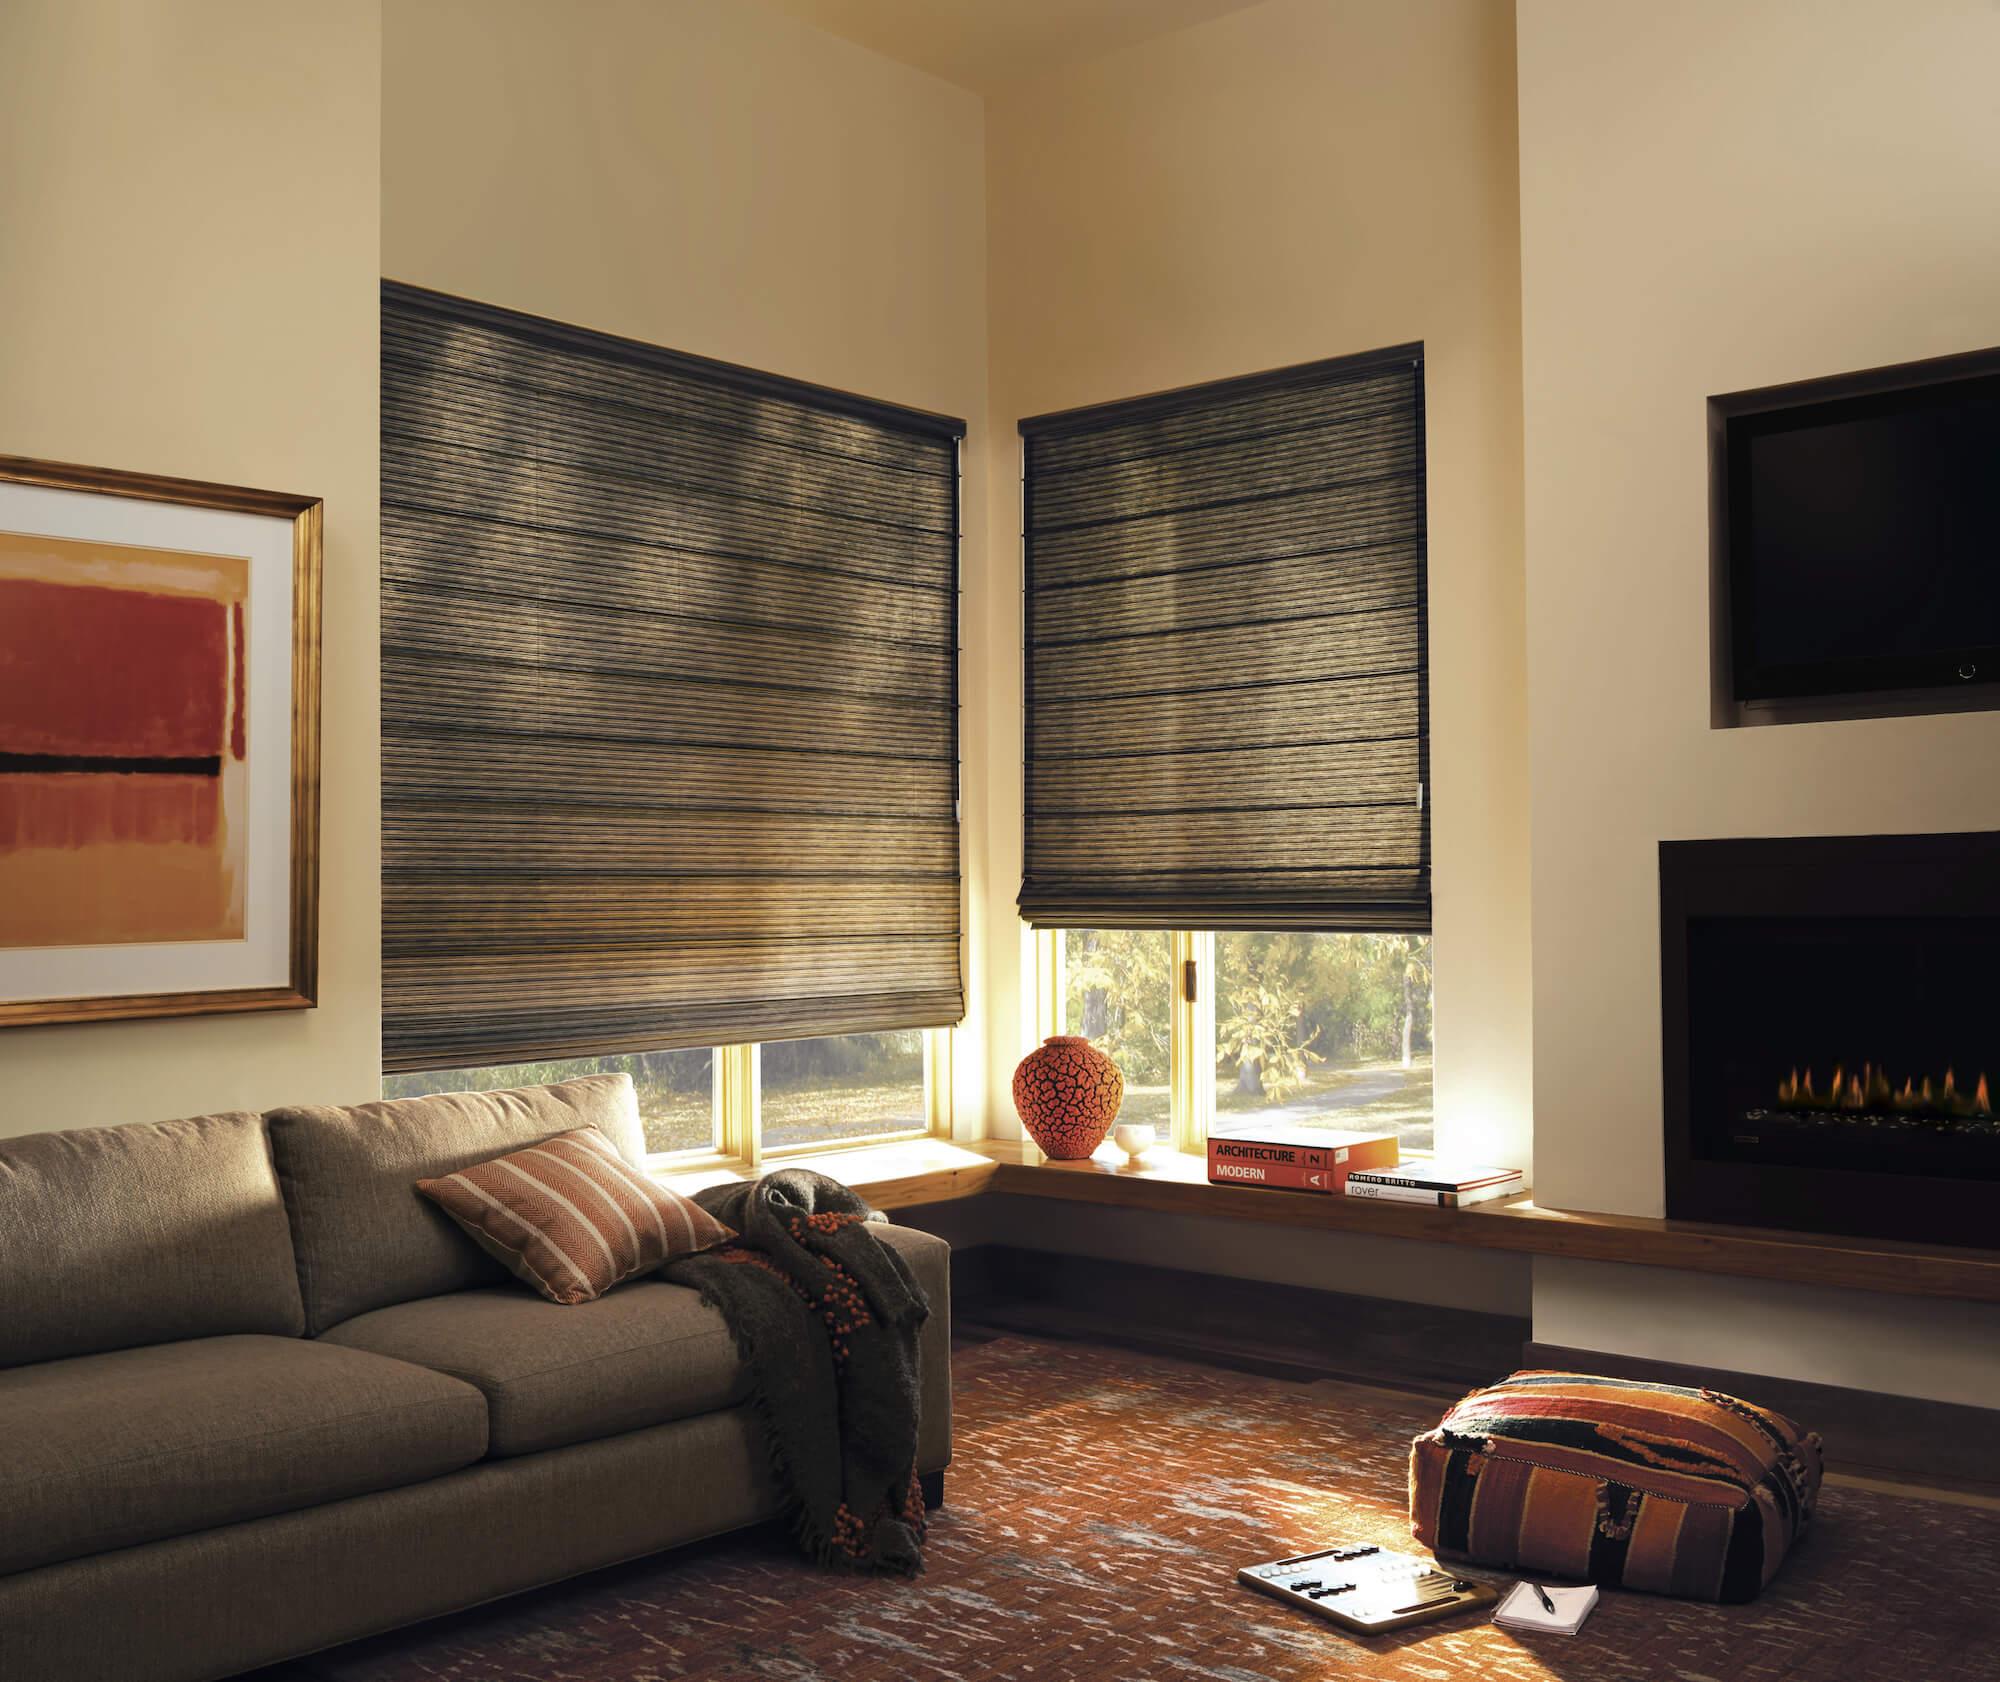 Design Studio Roman Shades in living room